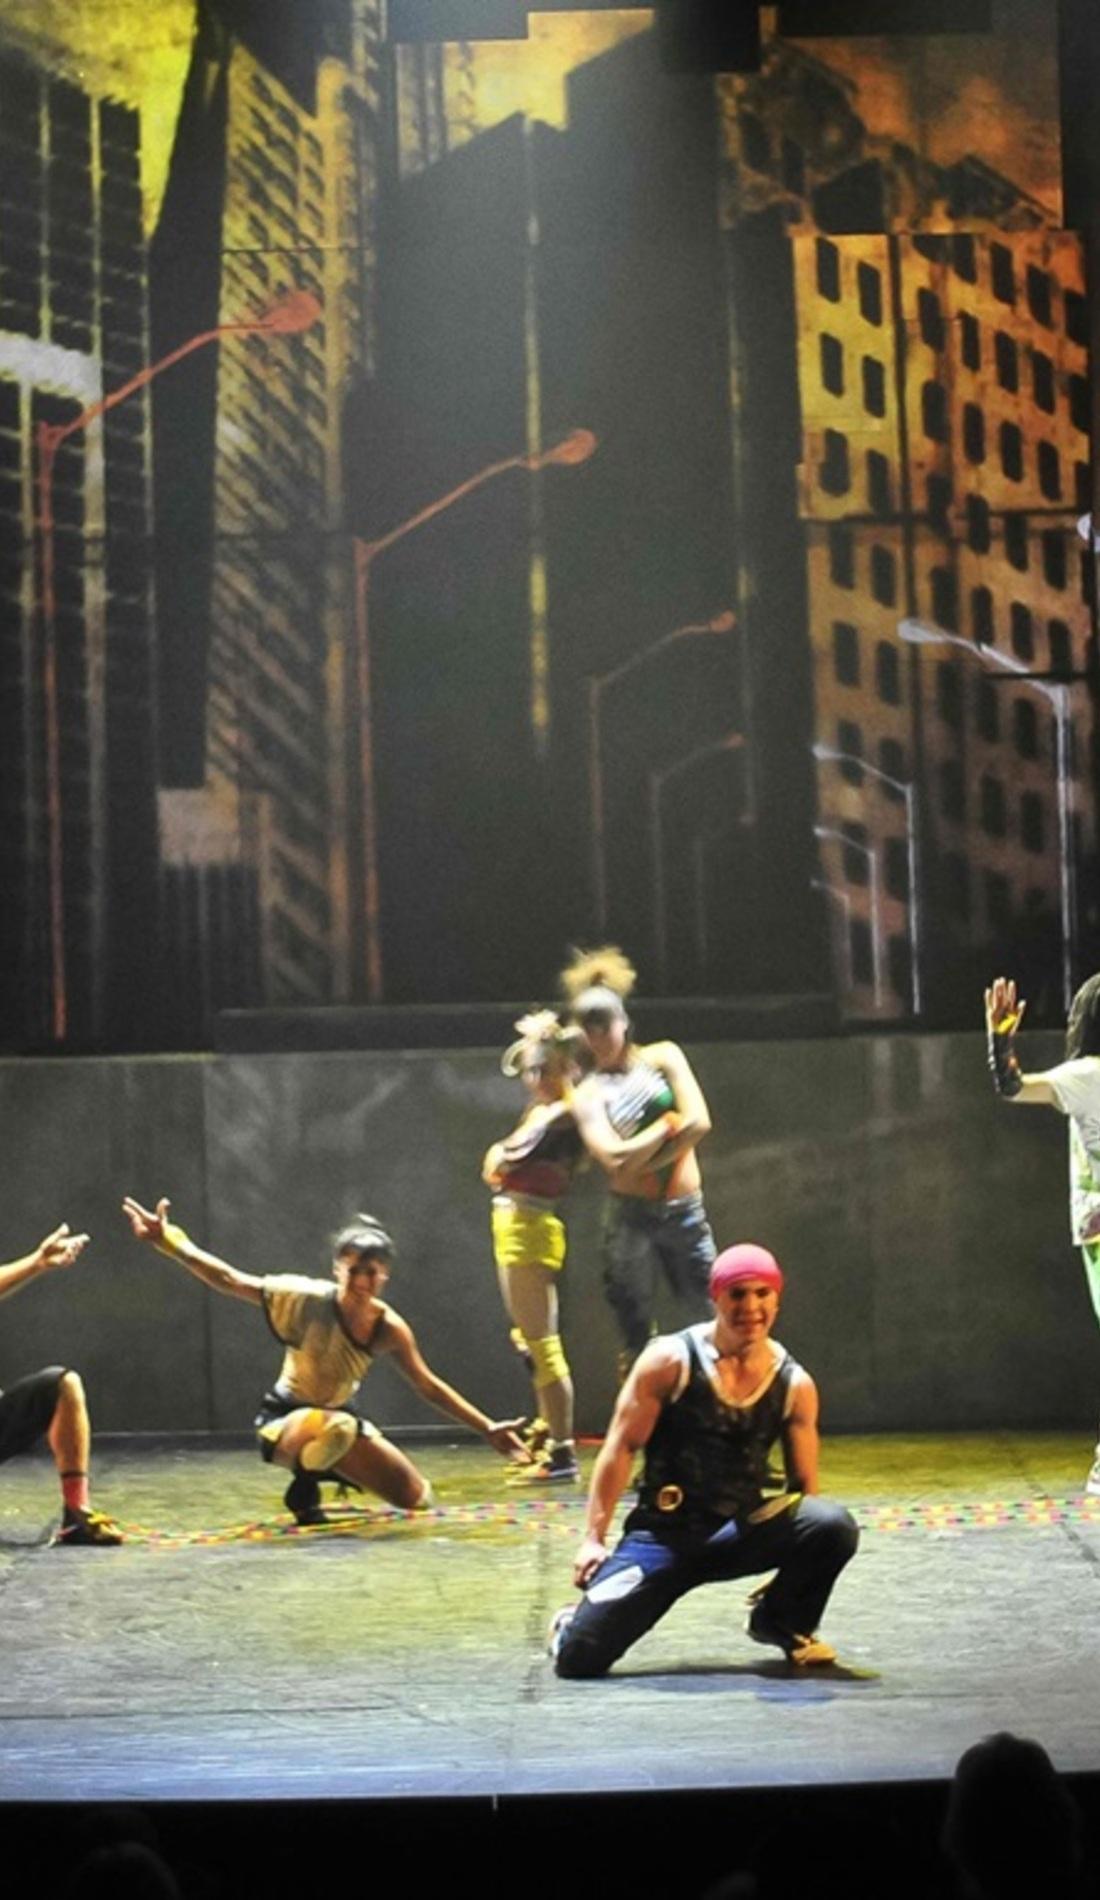 A Cirque du Soleil: Eloize live event